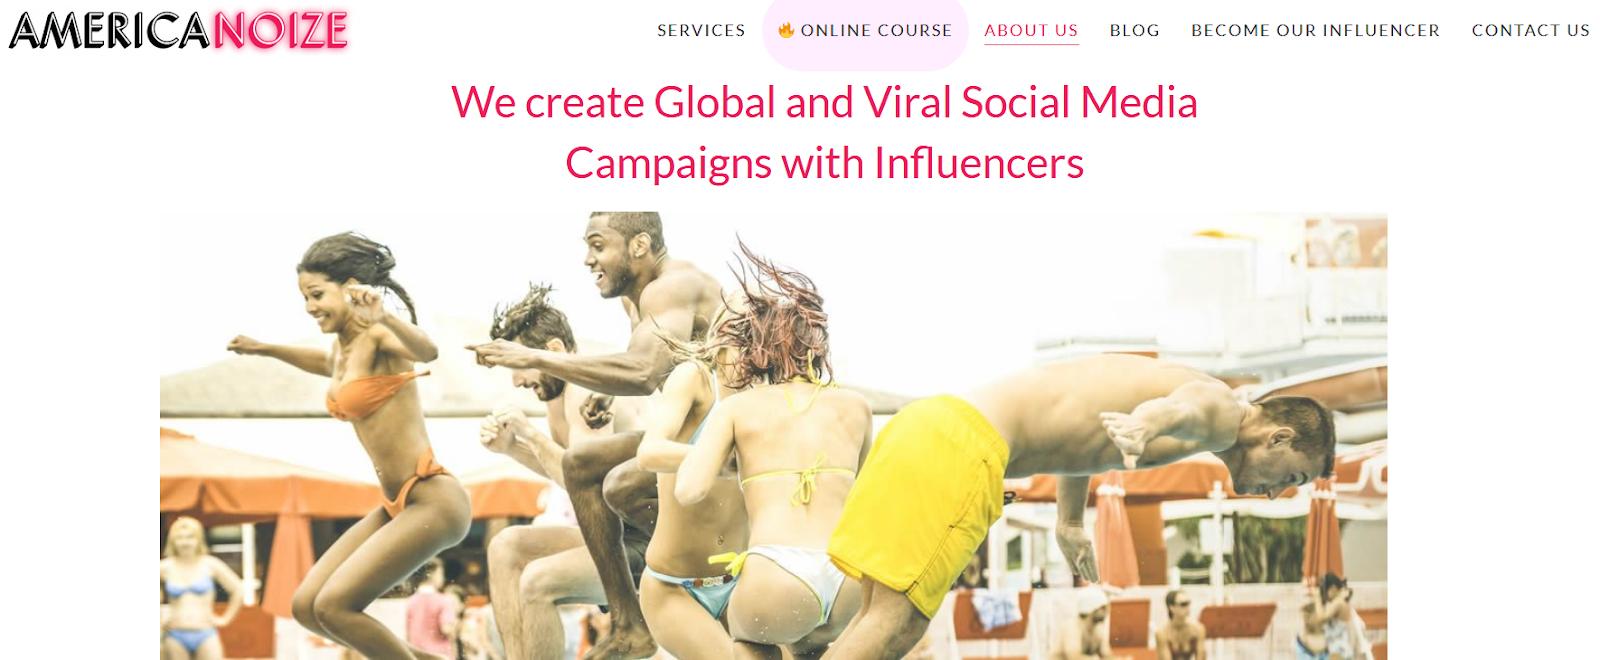 America Noize. Top influencer marketing agency 2021